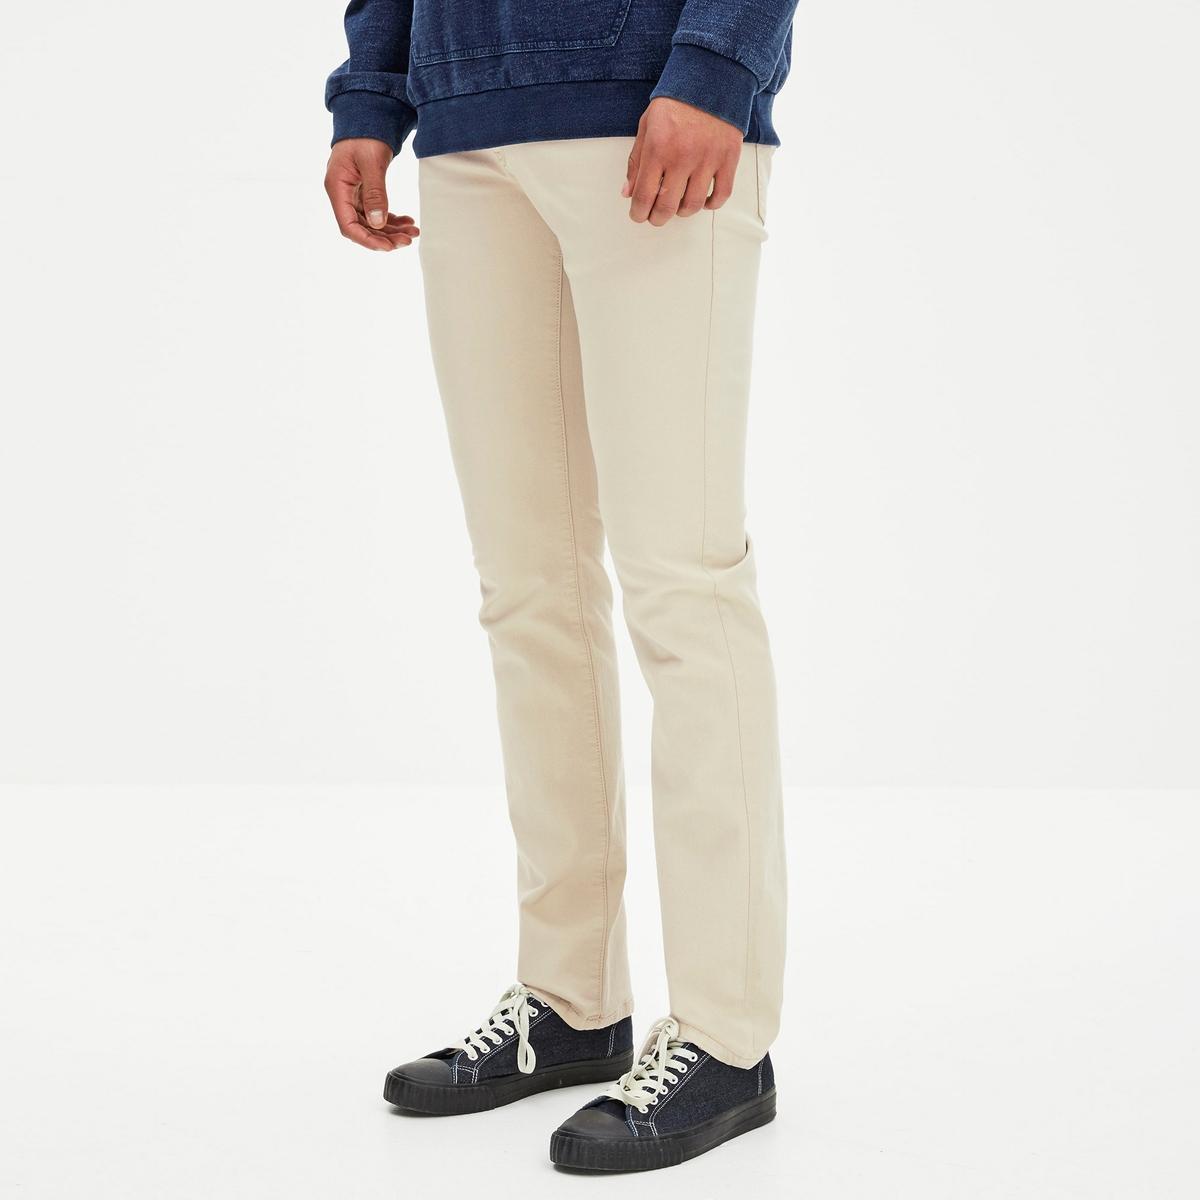 Calças corte slim en coton stretch GODOBY